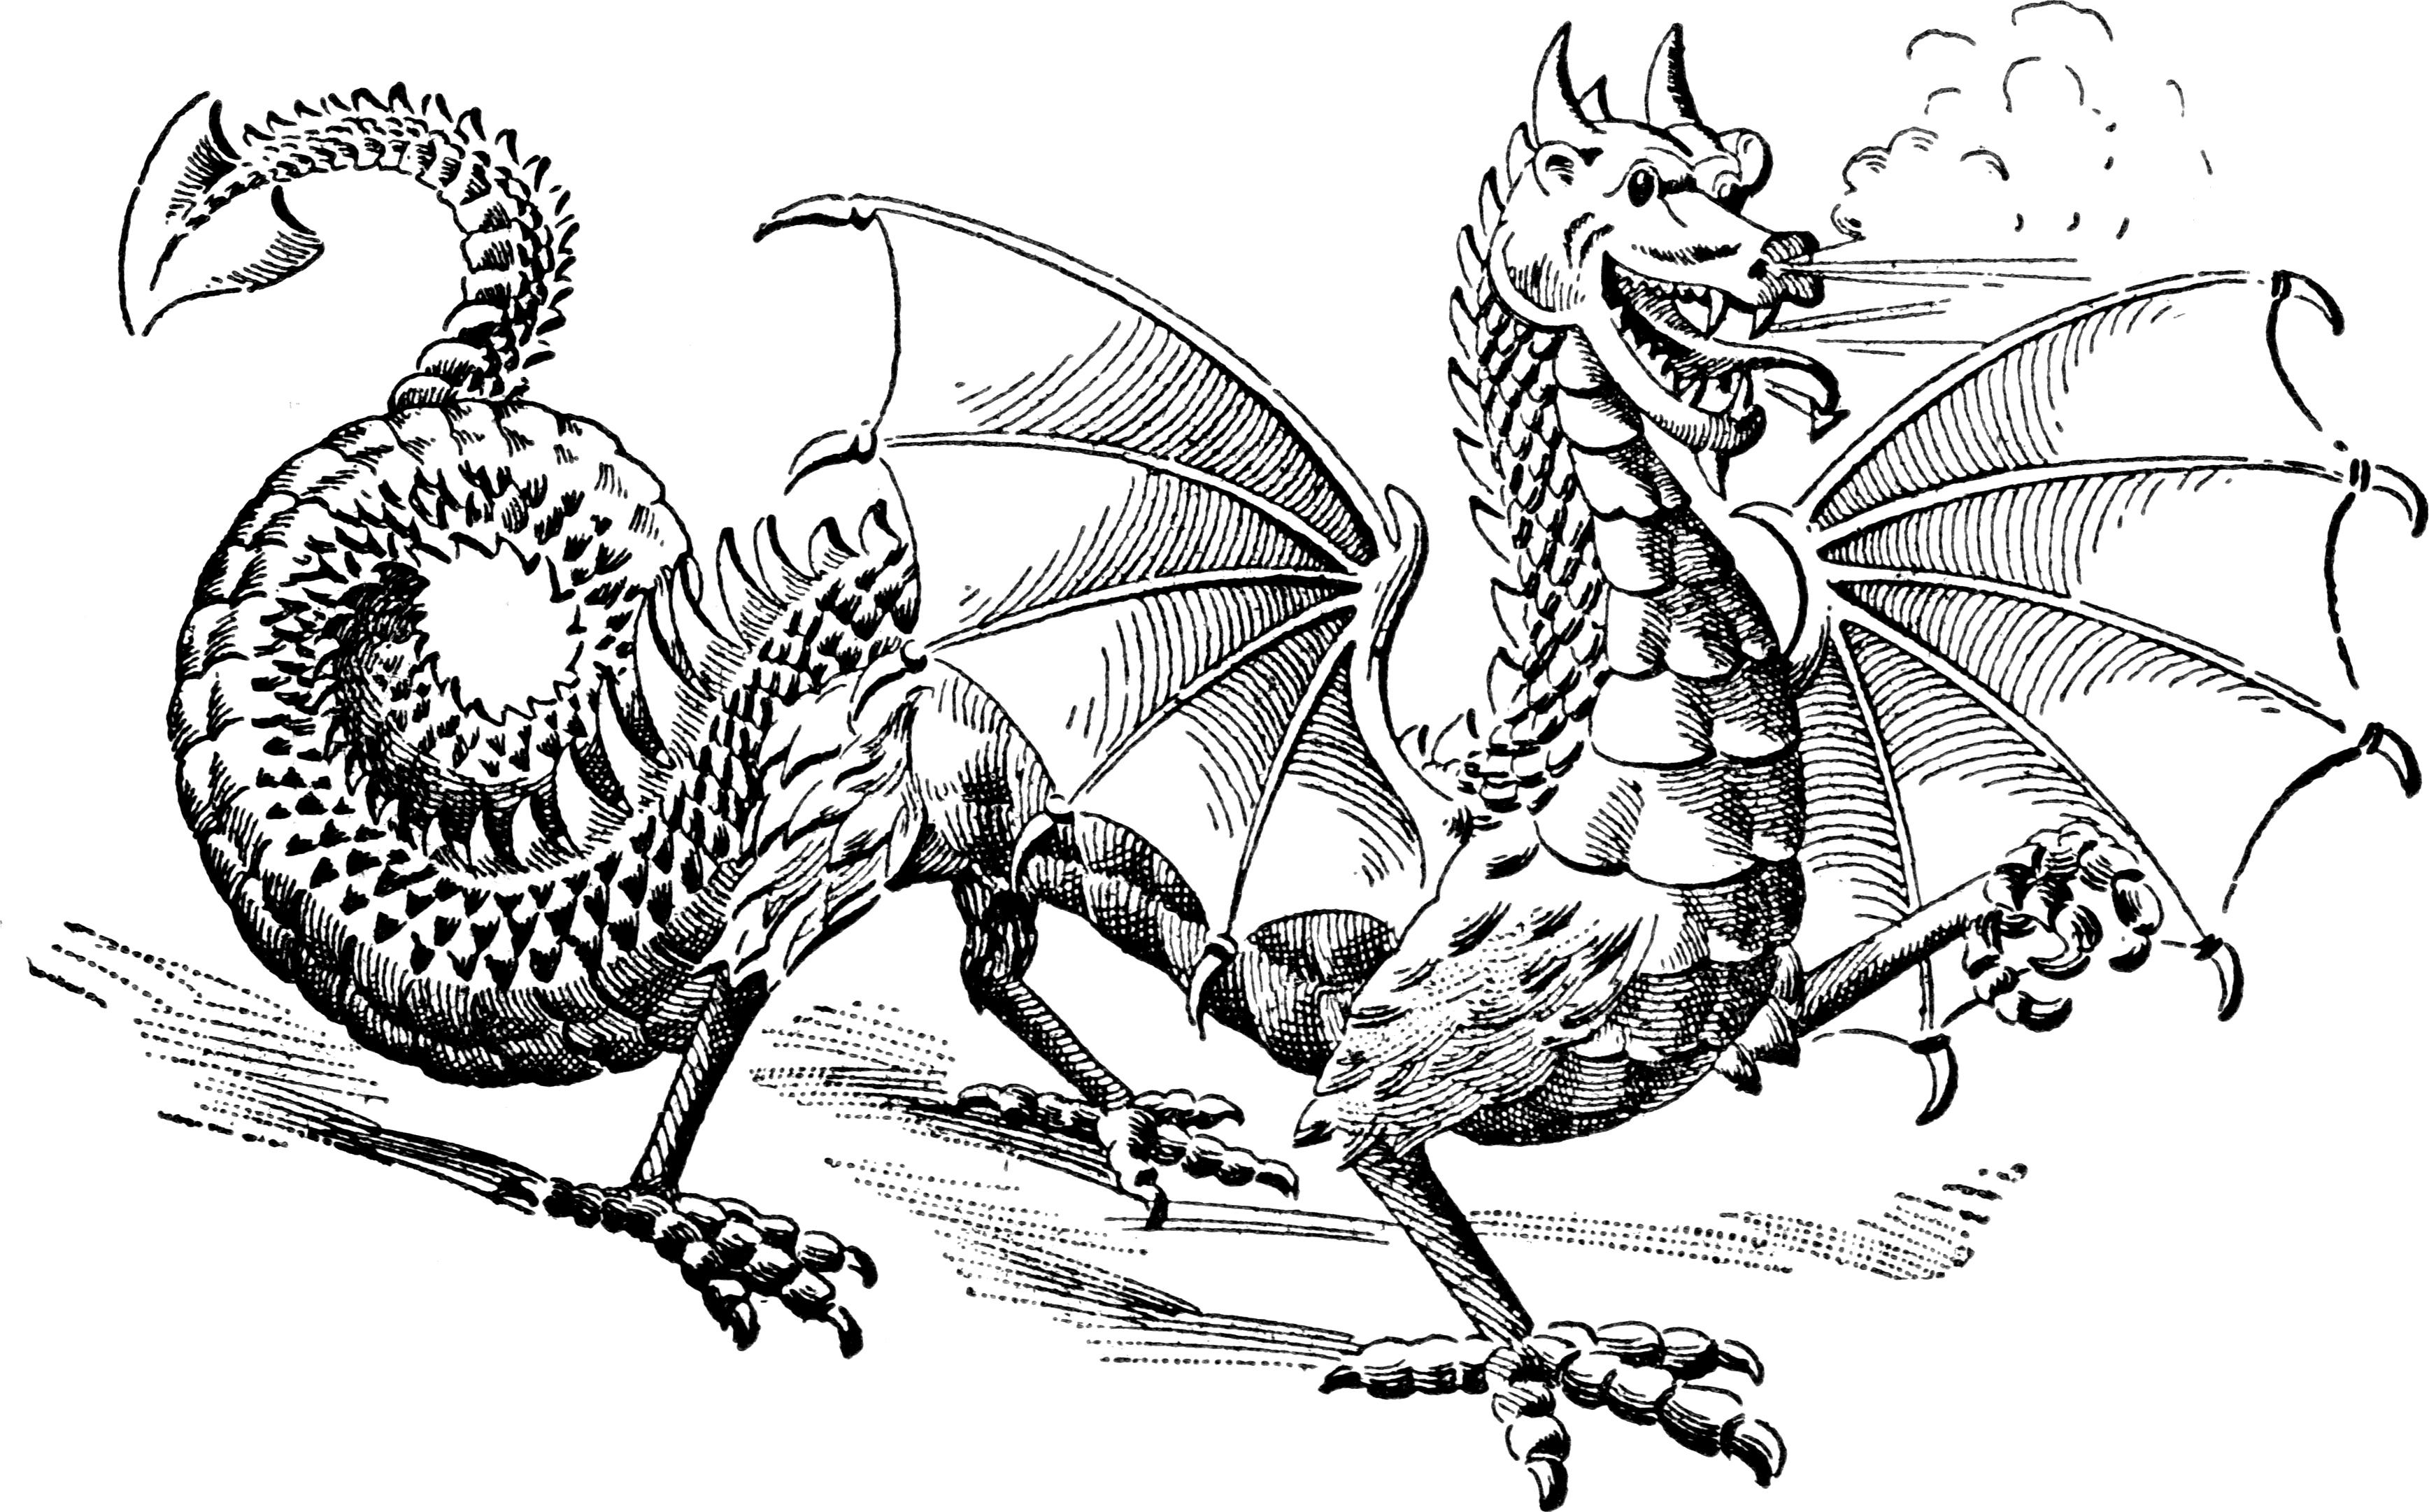 Engraving clipart victorian Gazette of Art Free 5